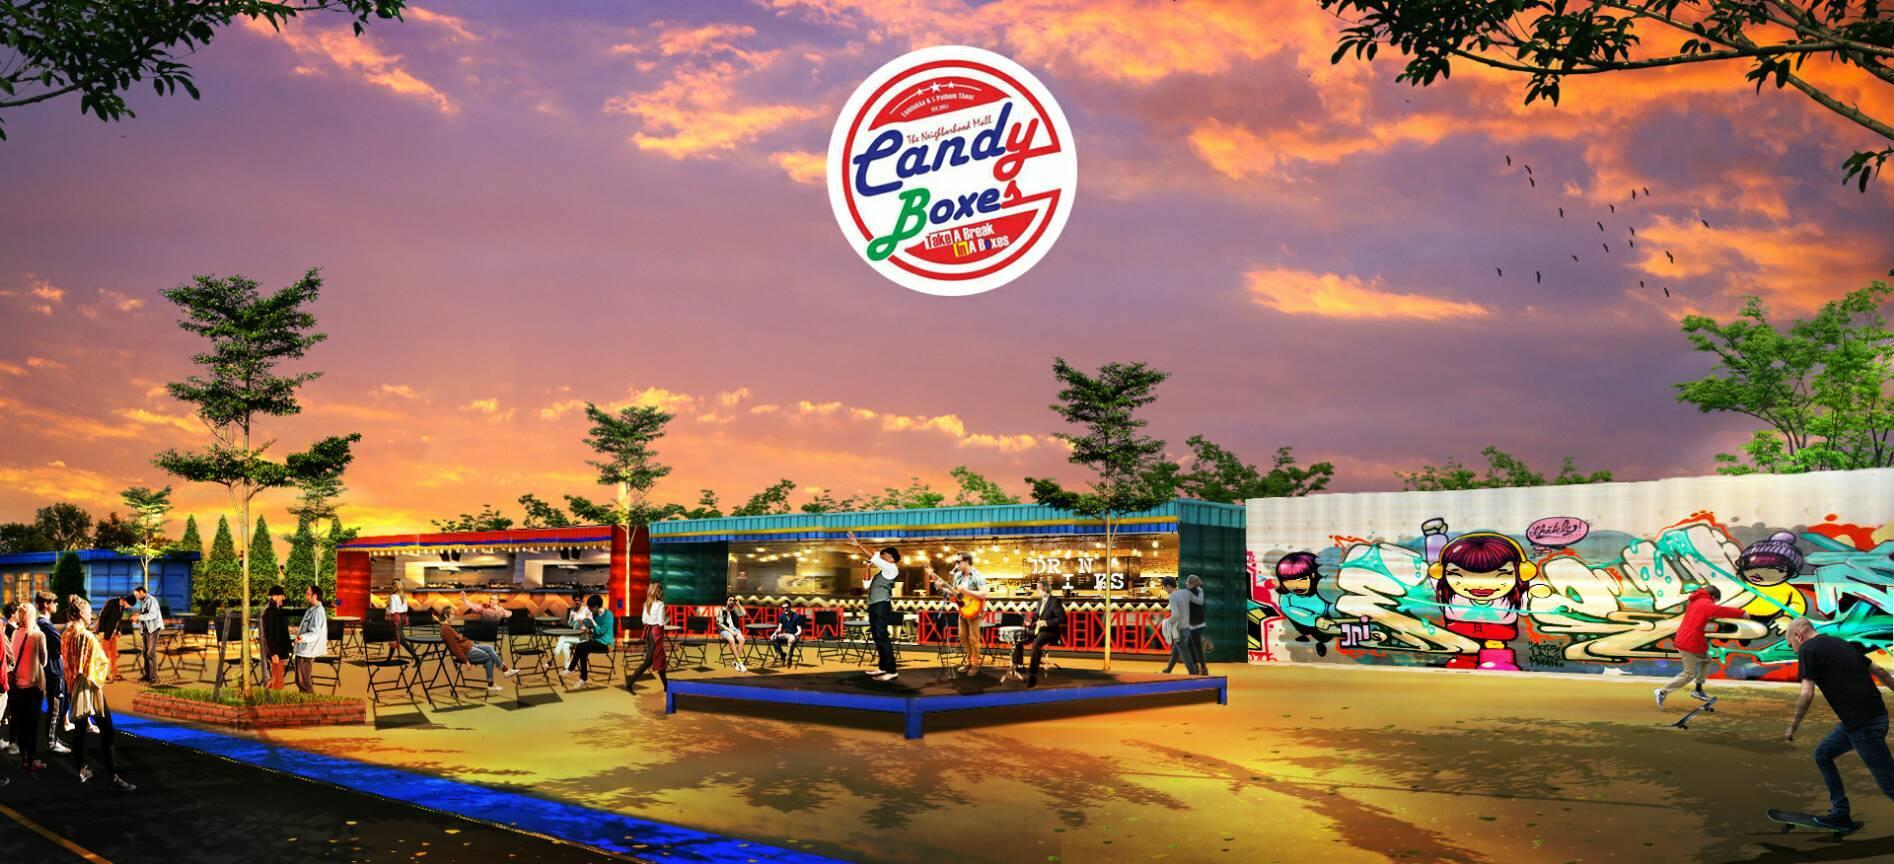 Candyboxes,แคนดี้บ๊อก,ตลาดนัด,ทำเลค้าขาย